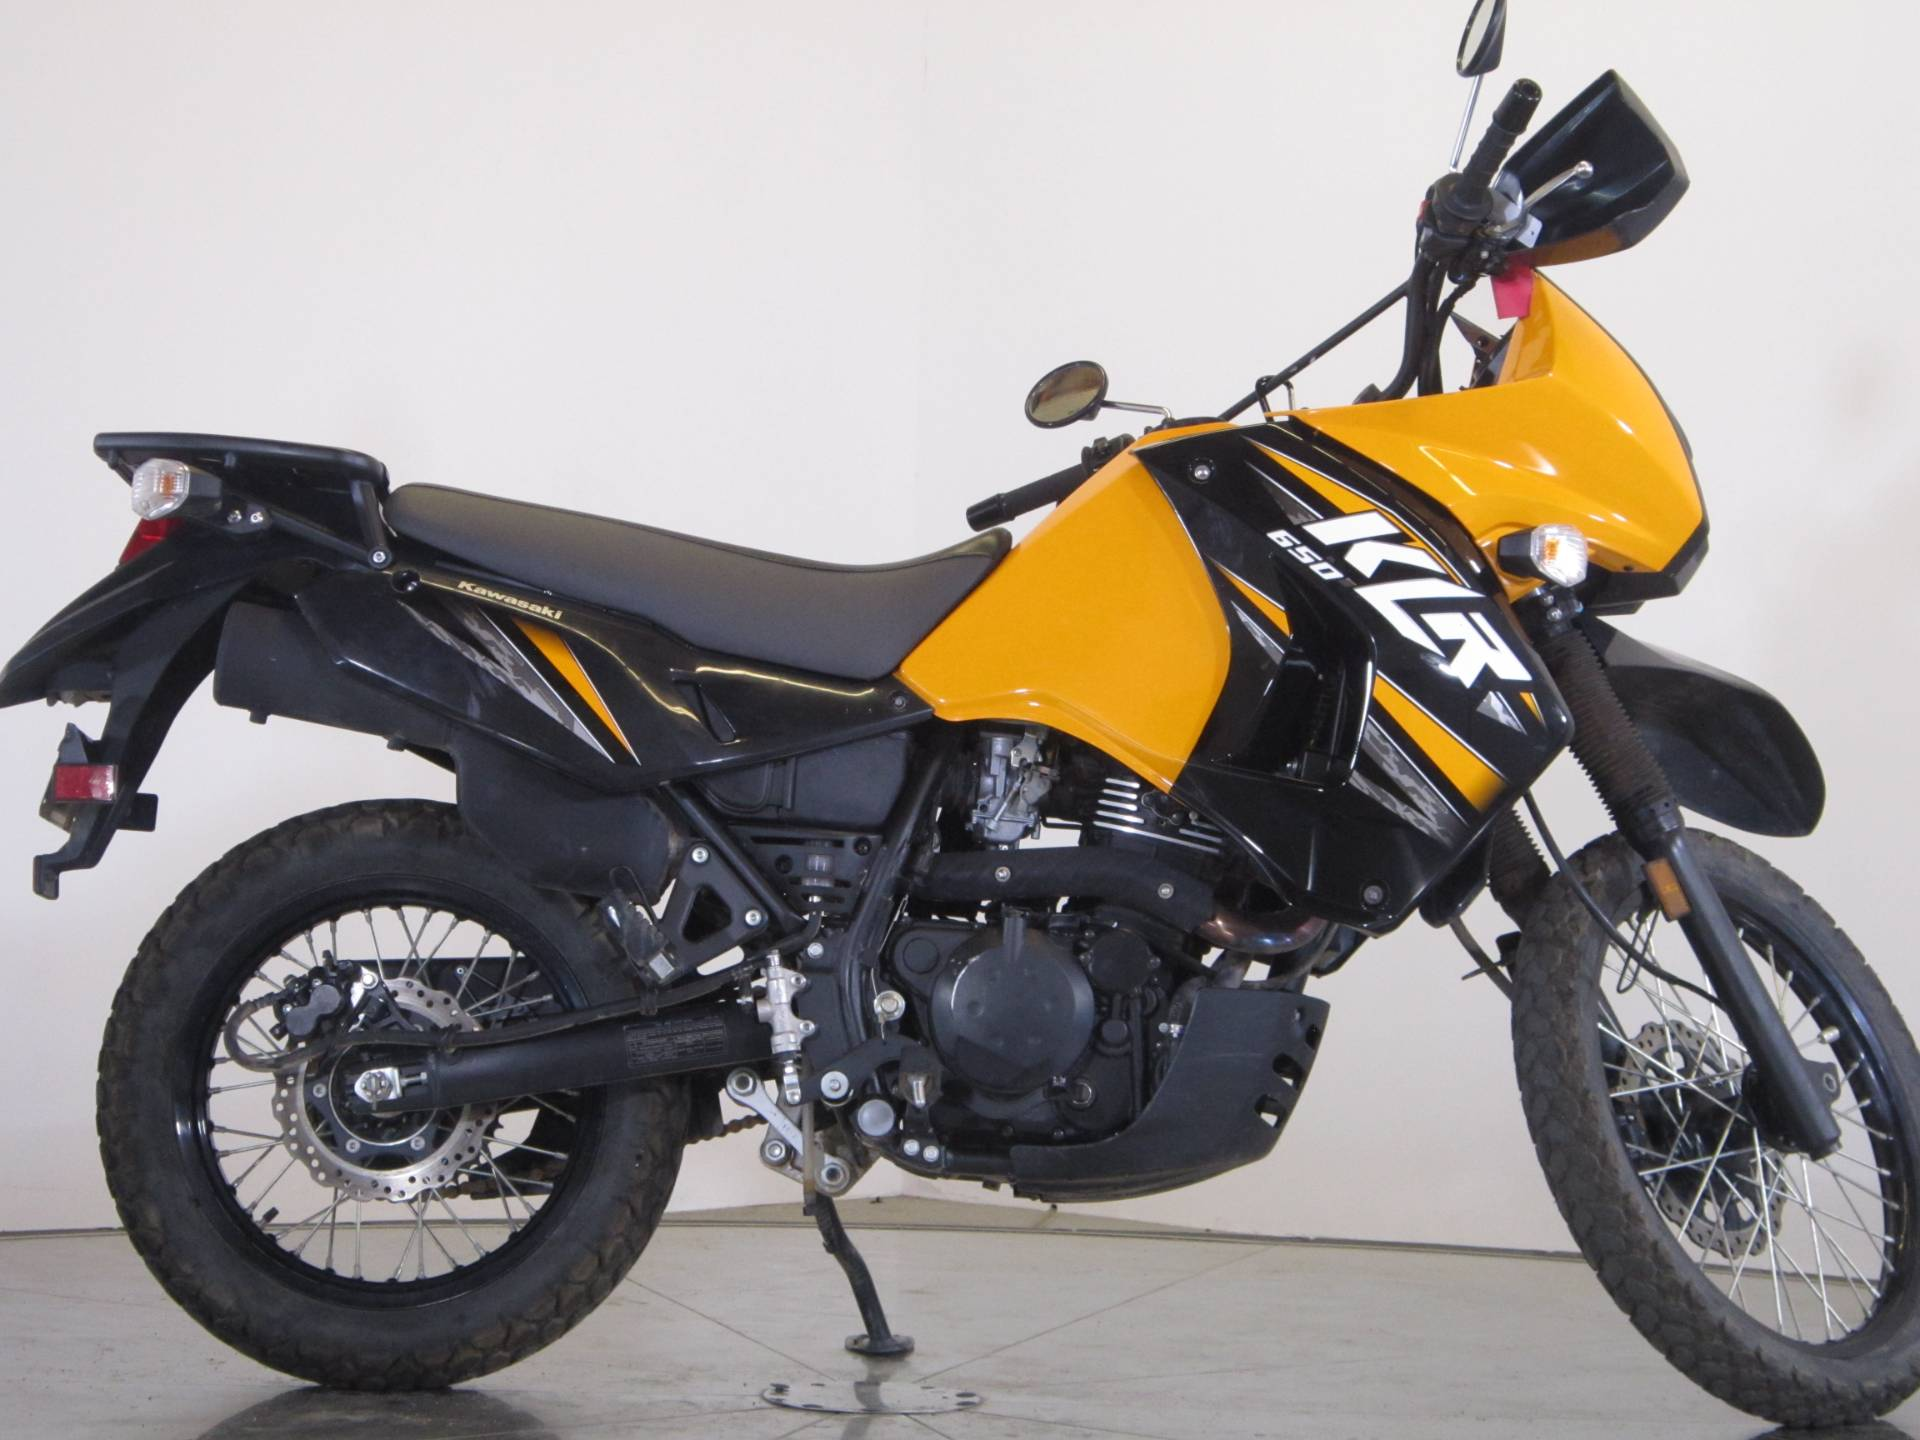 Used 2013 Kawasaki KLR™650 Motorcycles in Greenwood Village, CO ...